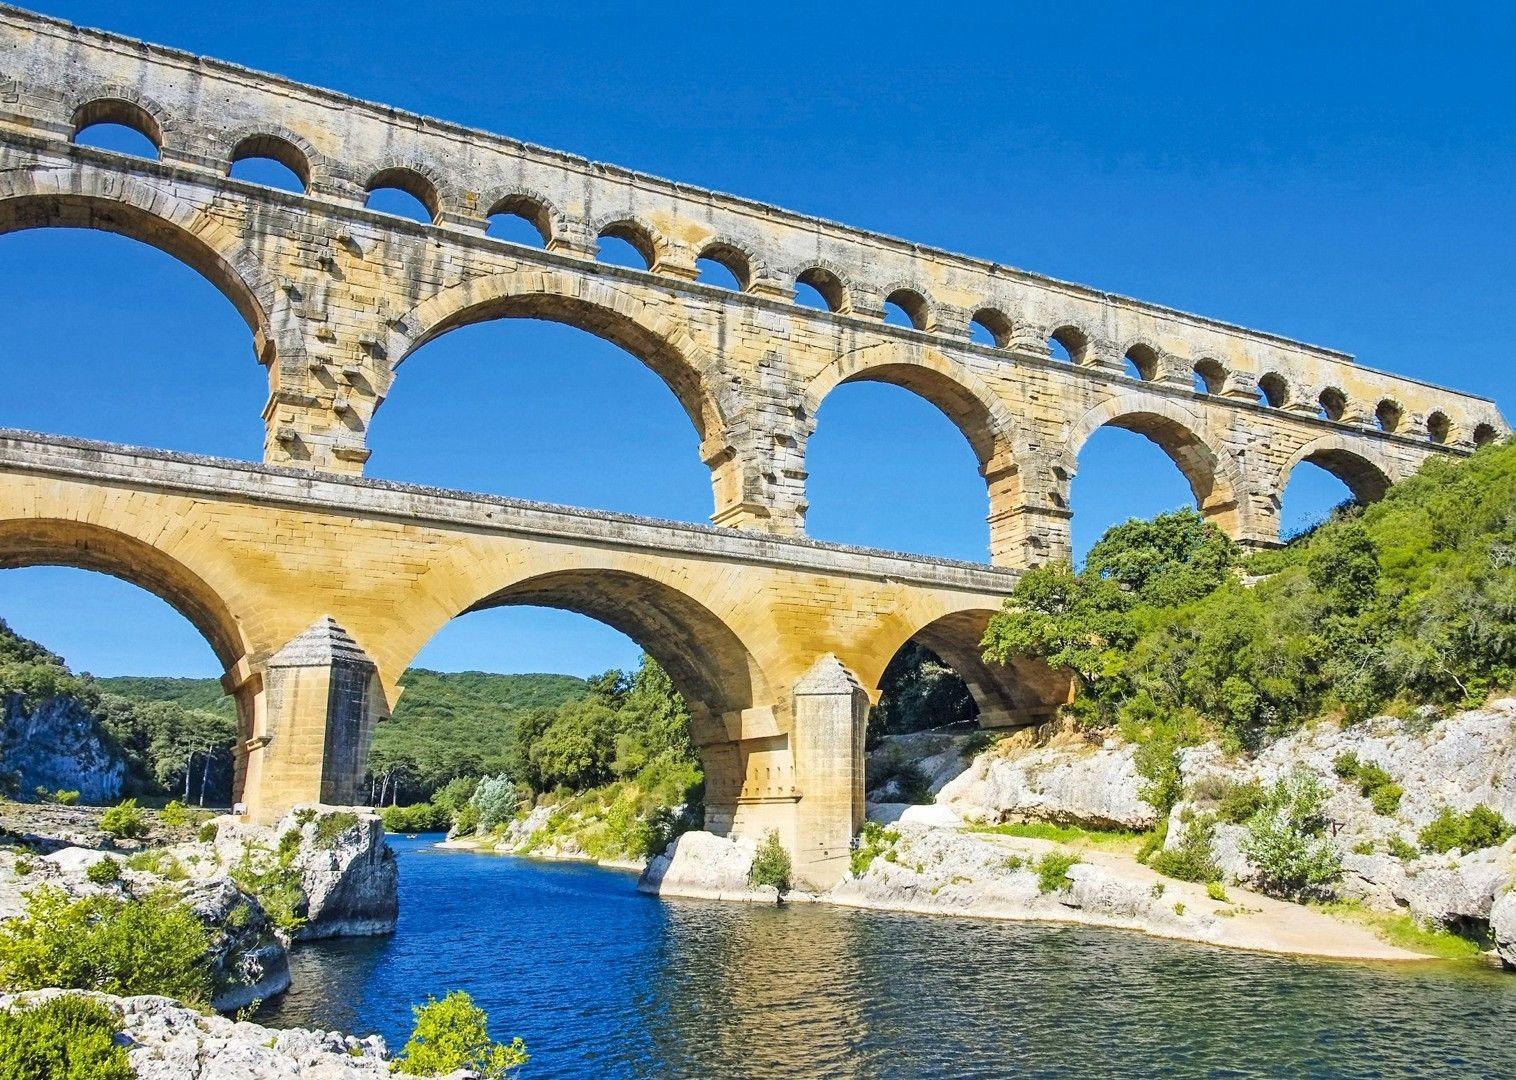 pont-du-gard-gardon-river-cycling-boat-cruise-holiday.jpg - France - Provence - Self-Guided Leisure Cycling Holiday - Leisure Cycling